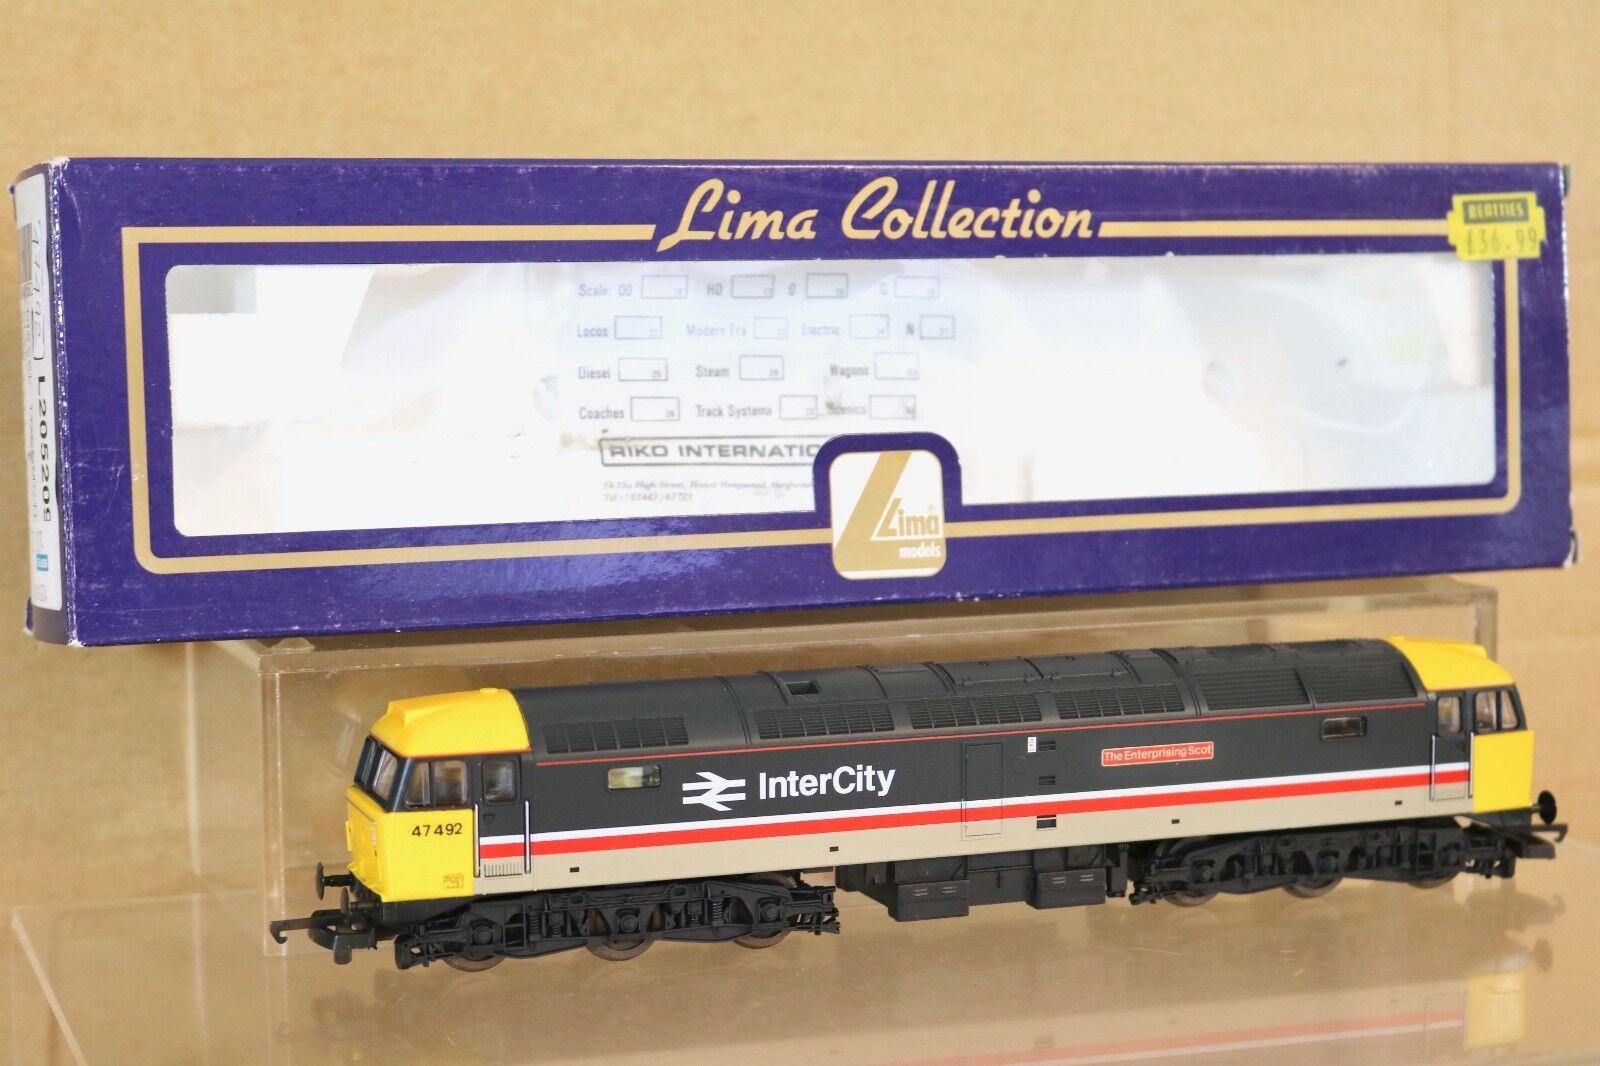 Lima 205209 Reacabados Scotrail Intercity Clase 47 Loco 47492 Enterprising Scot